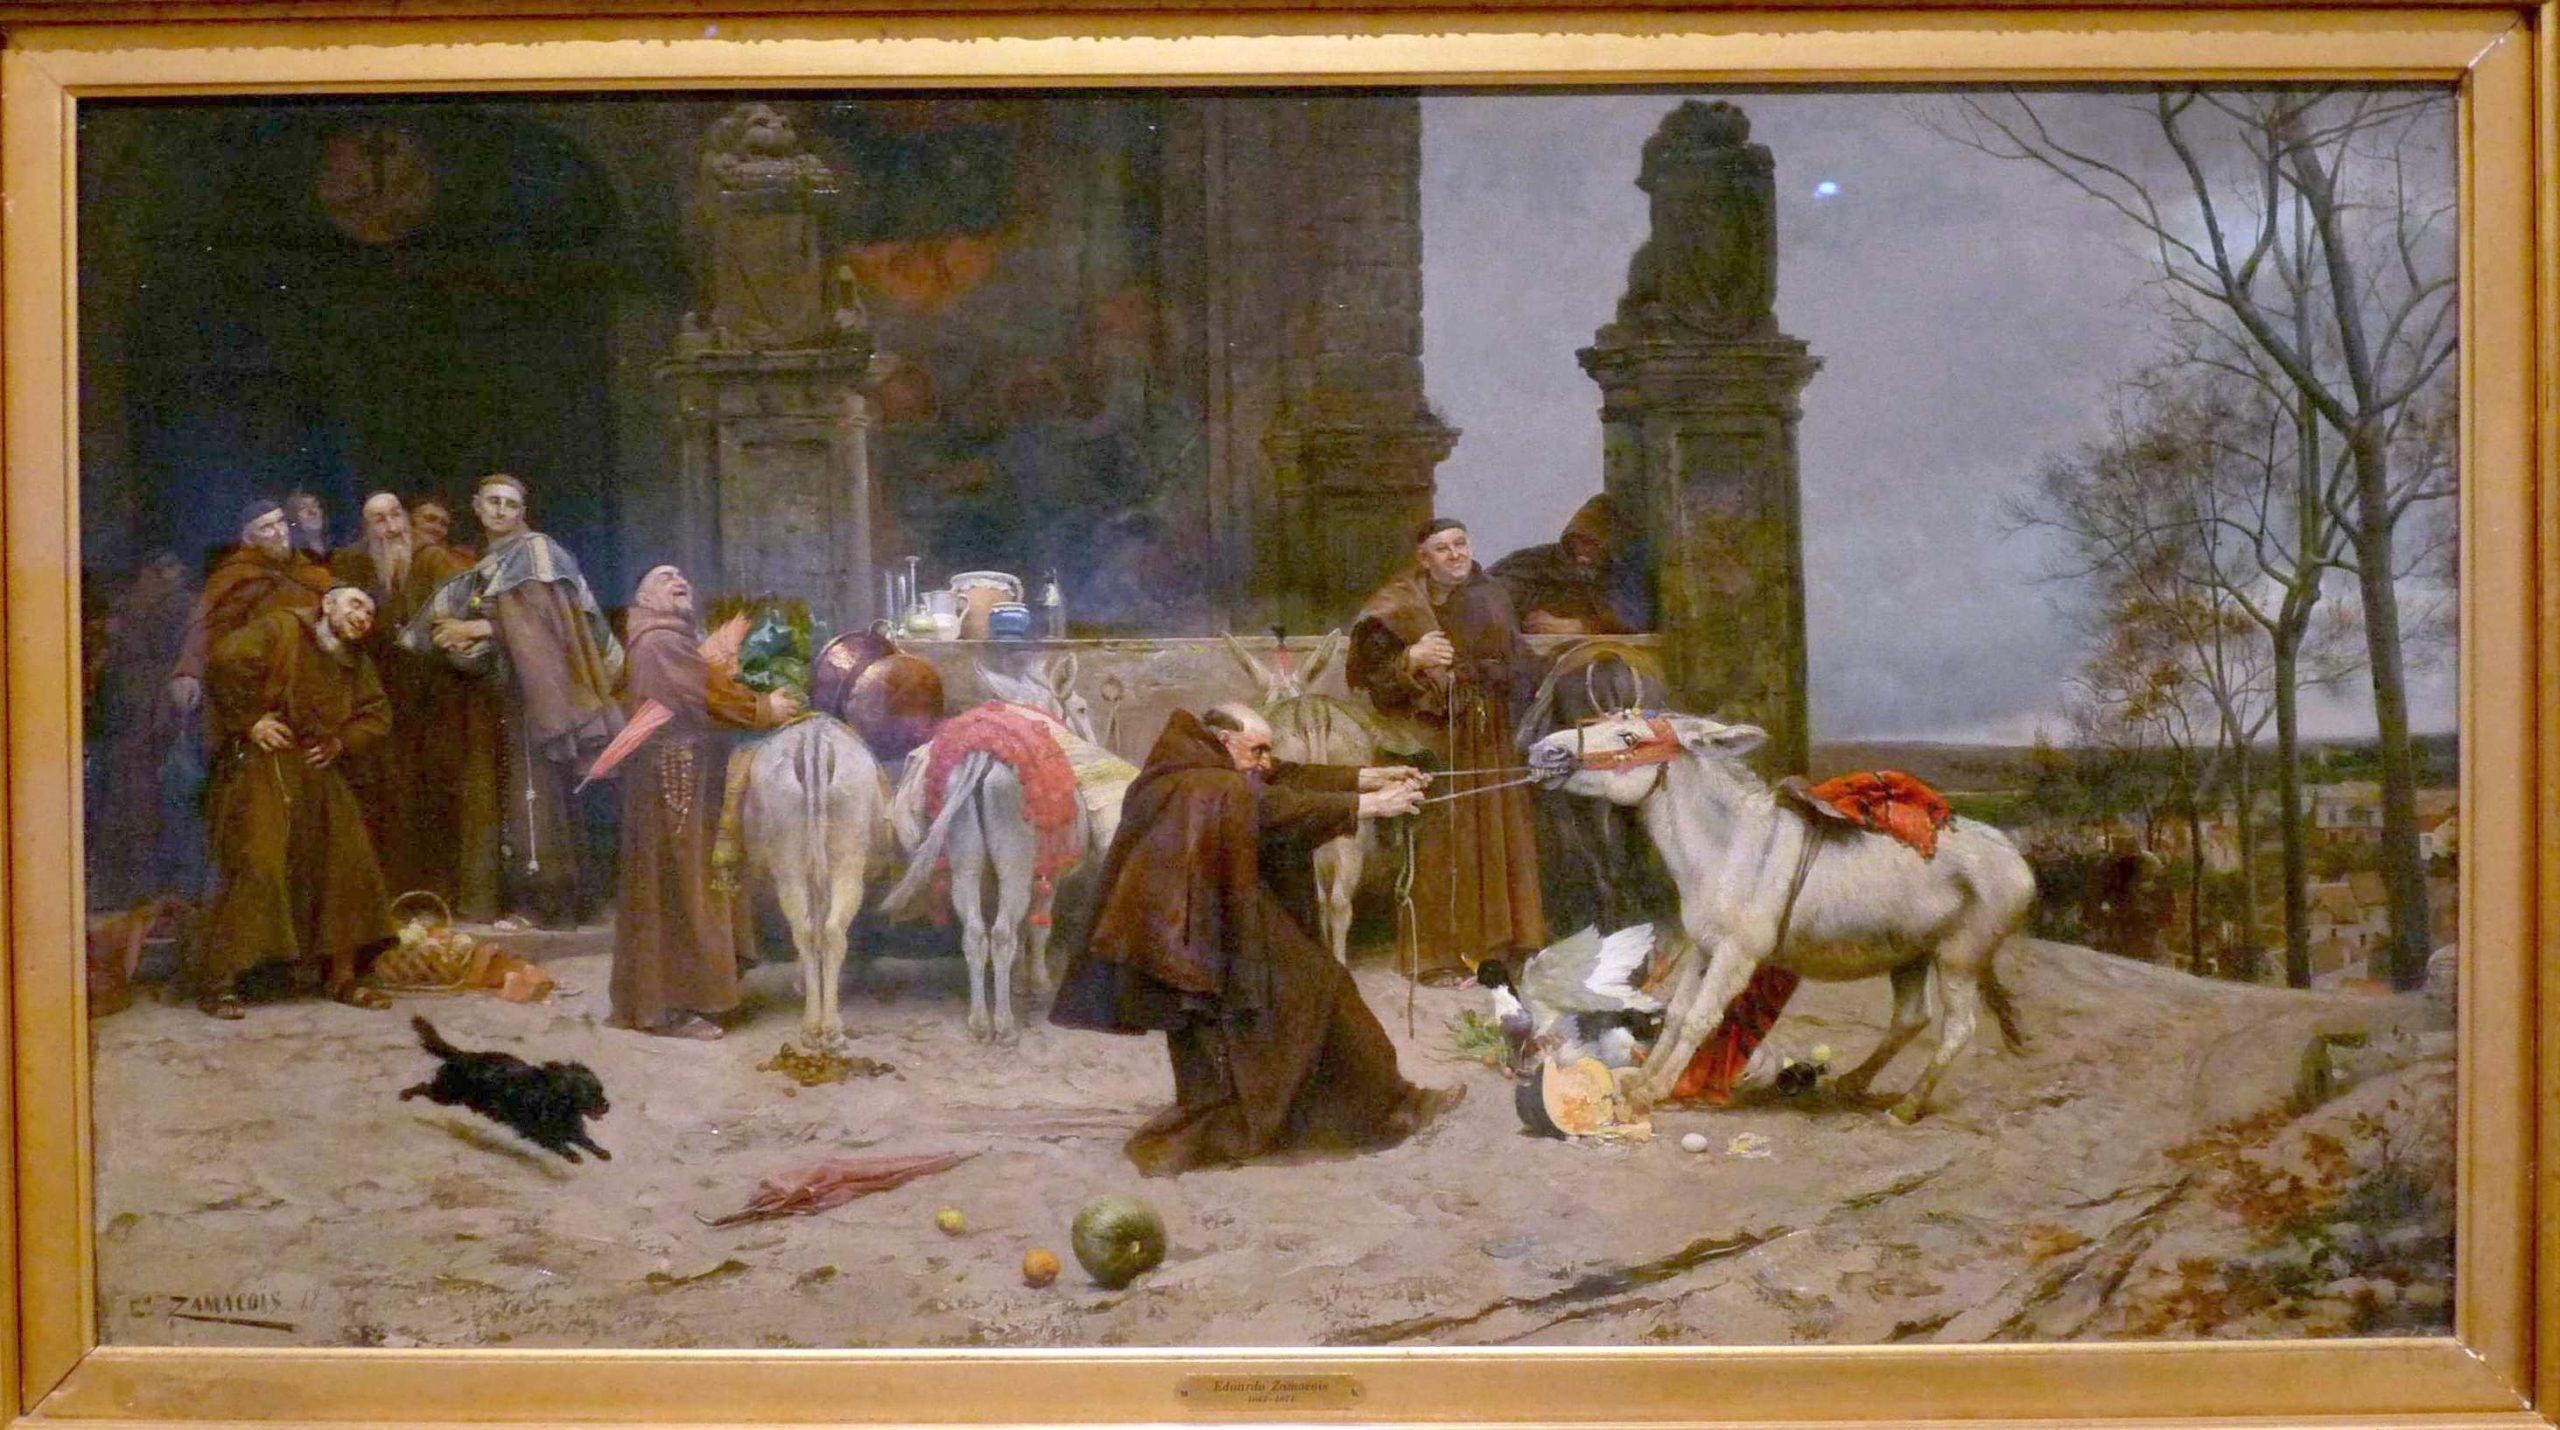 1868 Zamacois Eduardo, Regresso al Convent, Fondation Carmen Thyssen, Malaga